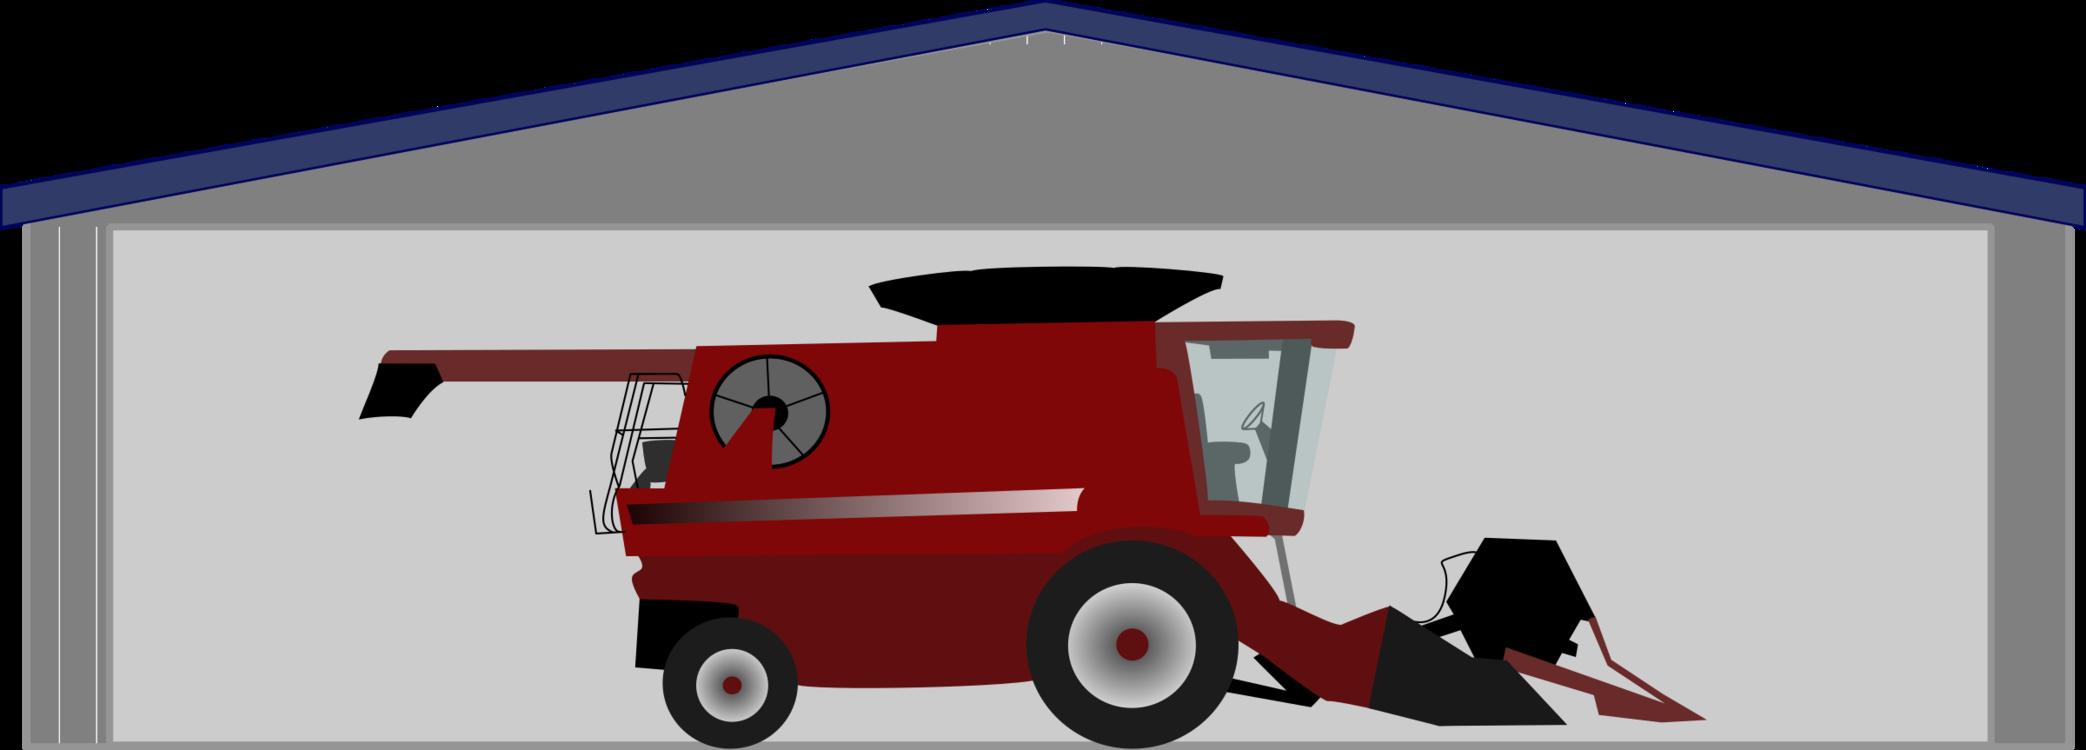 Car,Motor Vehicle,Red